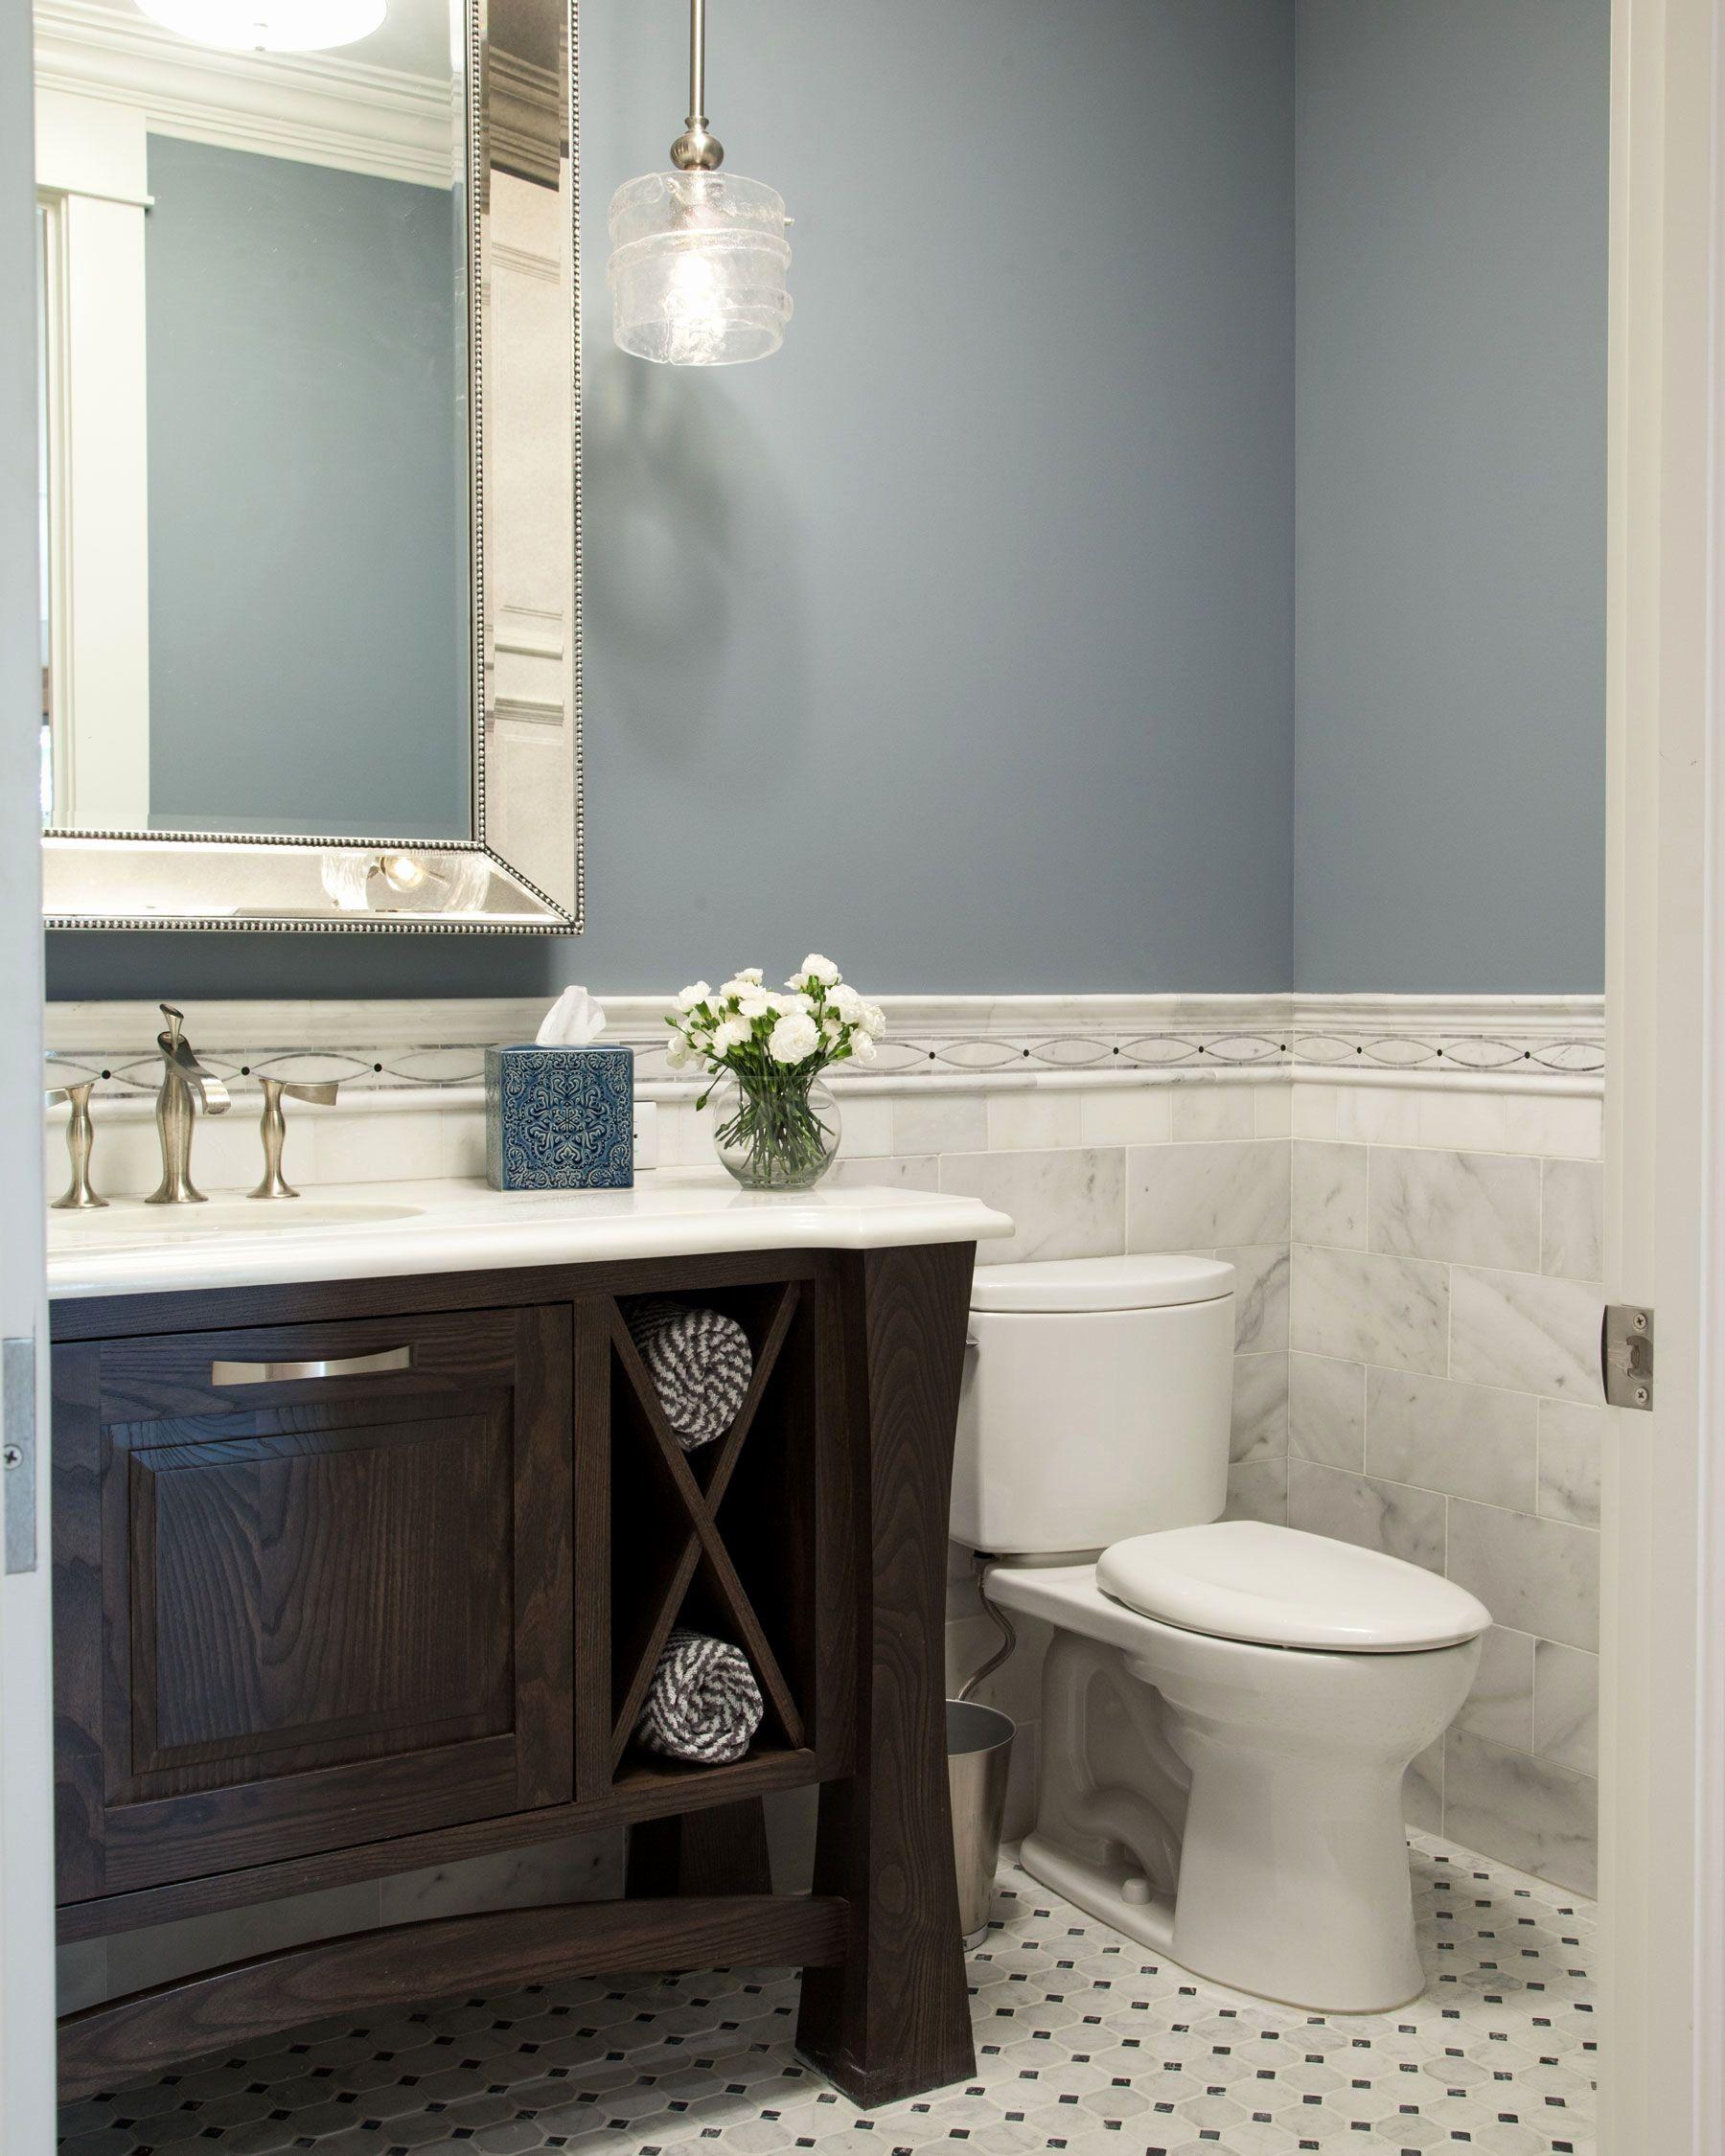 37 Modern Bathroom Vanity Ideas For Your Next Remodel In 2020 Bathroom Mirror Storage Small Bathroom Ideas On A Budget Bathroom Vanity